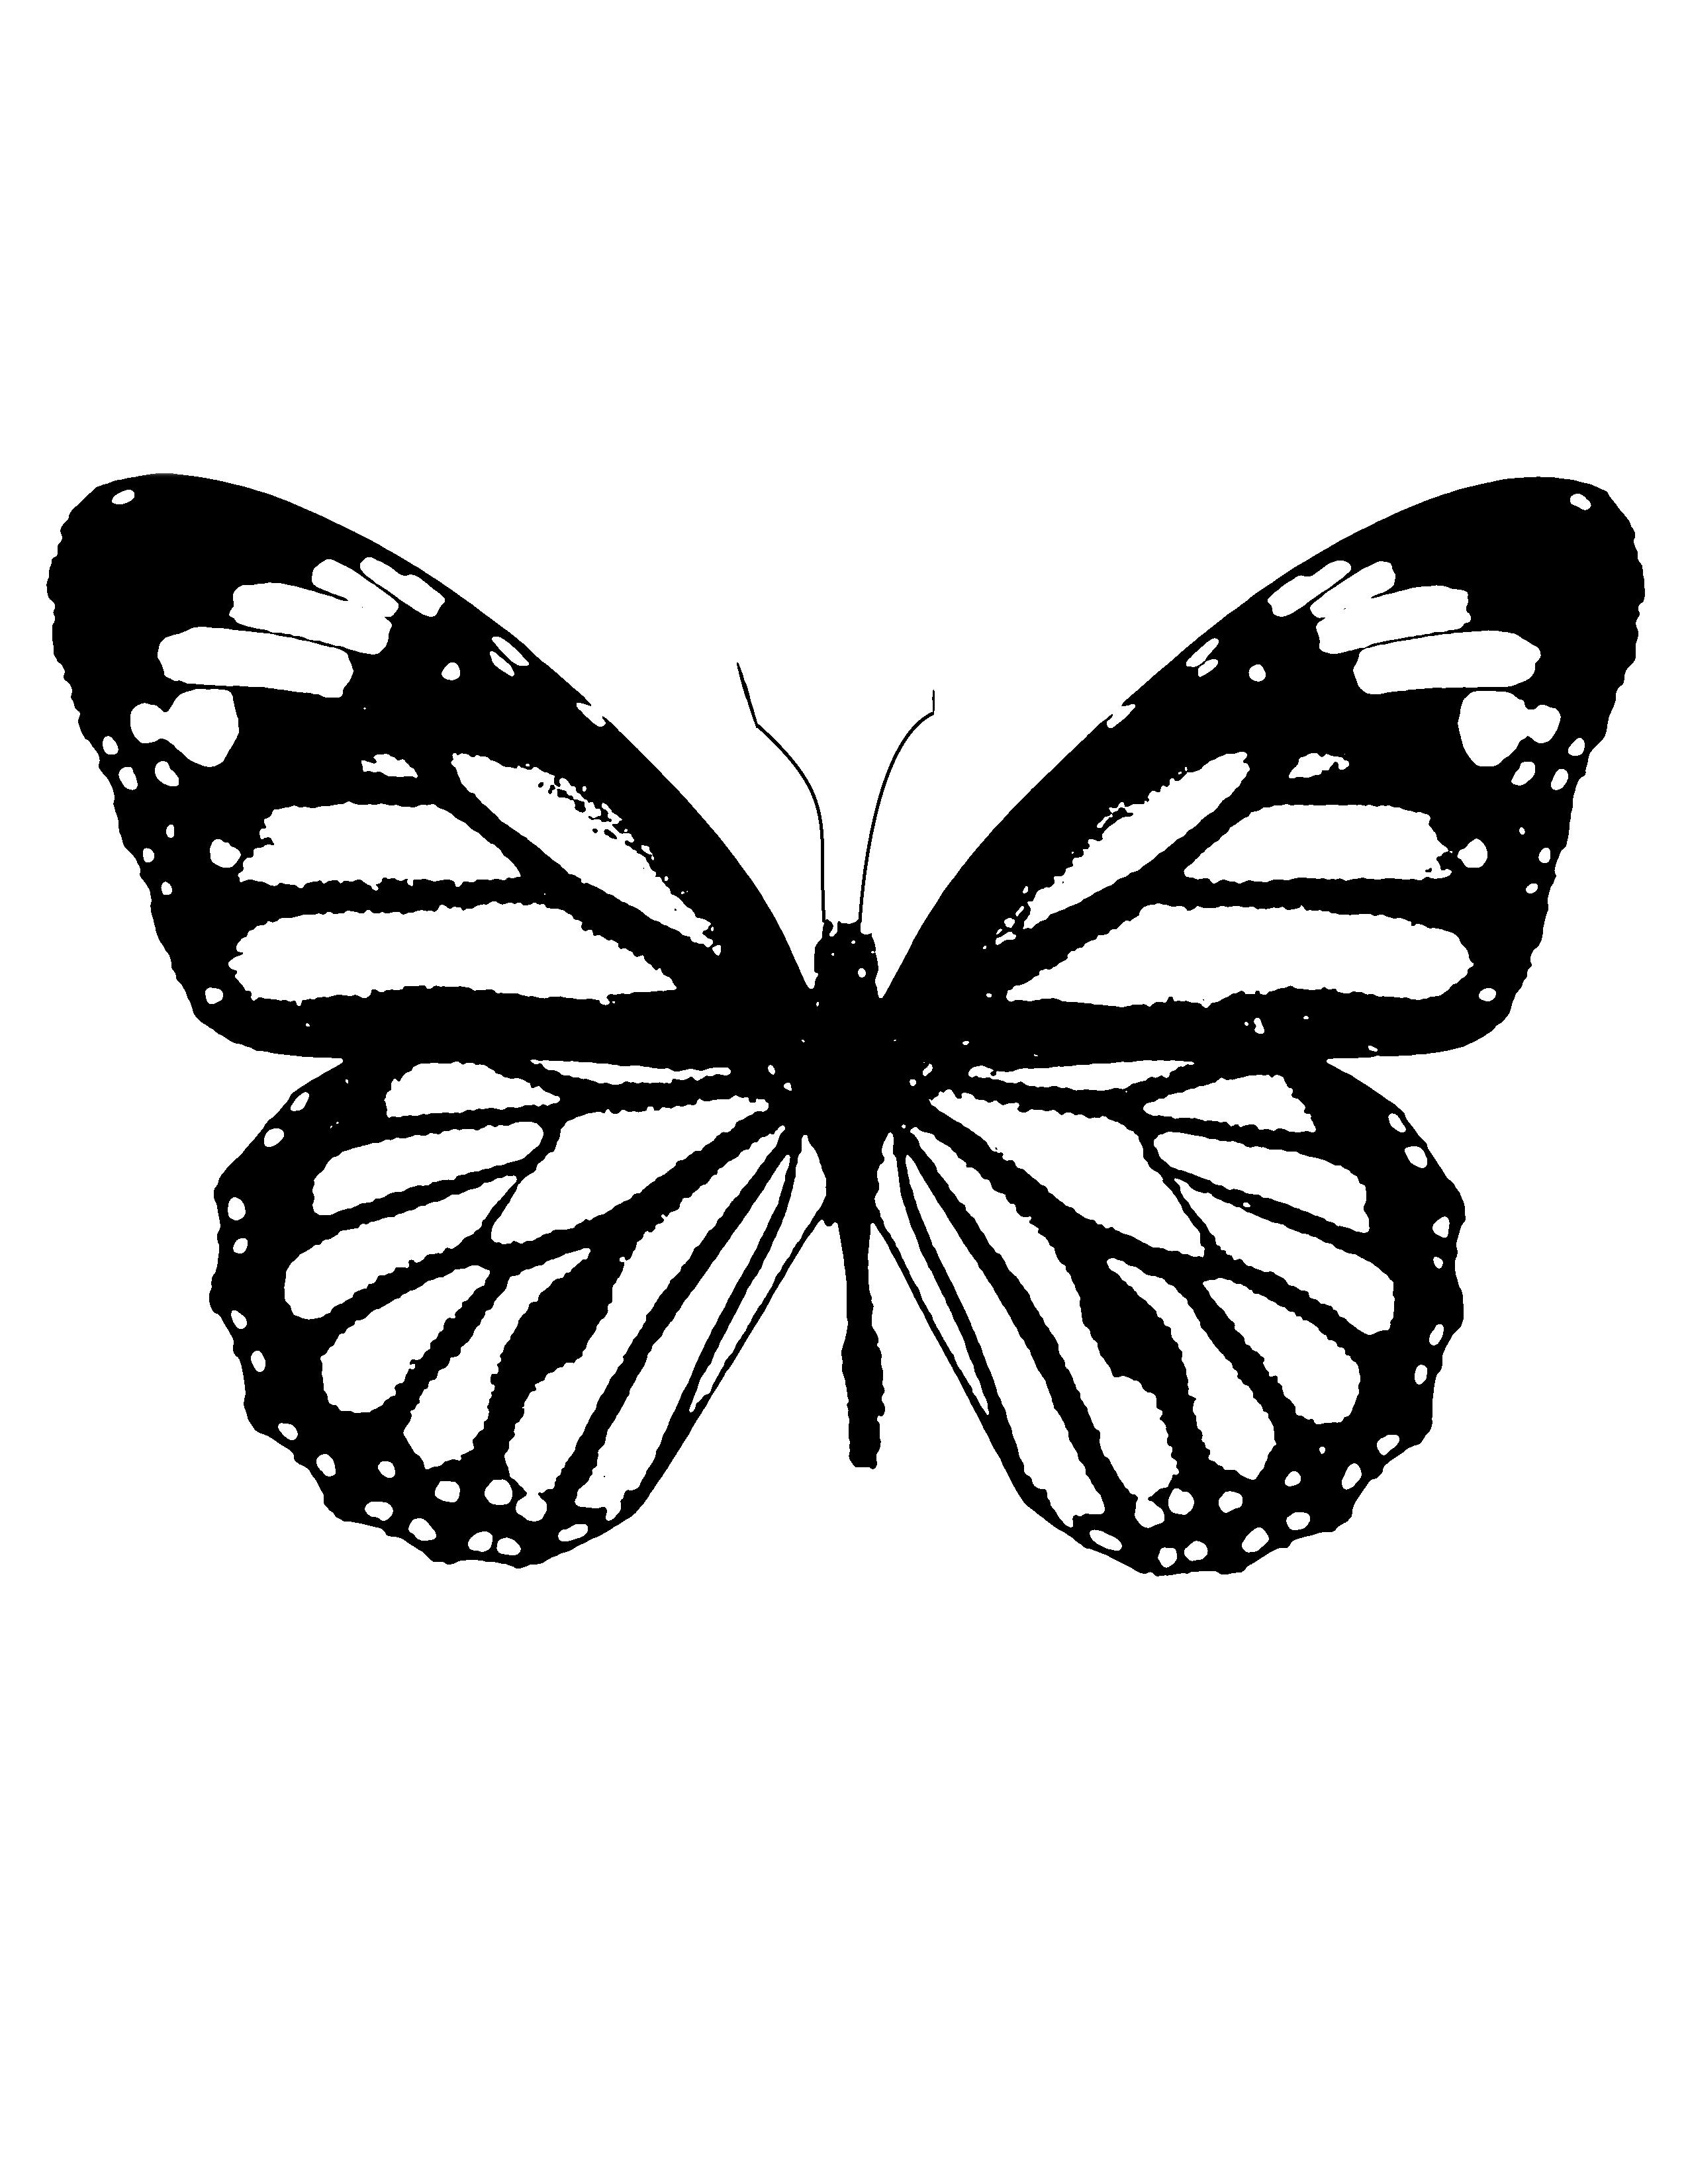 Animal Stencil Butterfly Stencil Card making Craft Stencil Airbrush